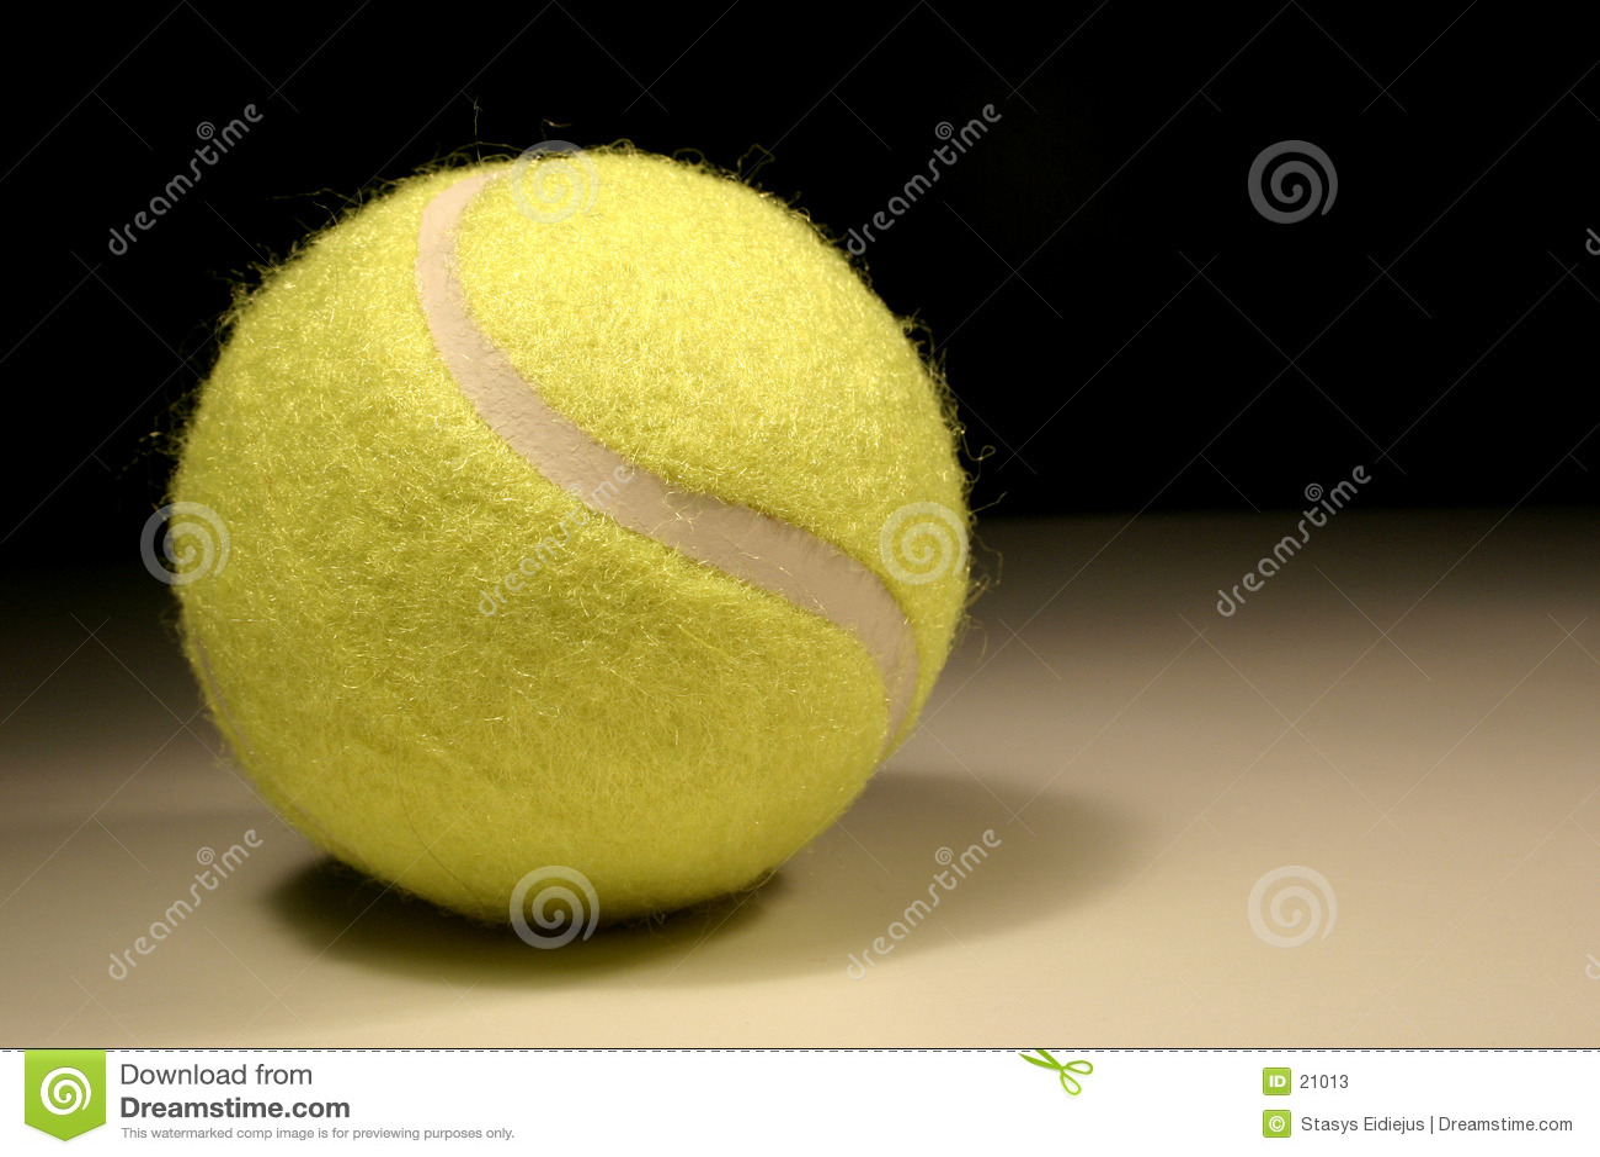 Tenis-bola